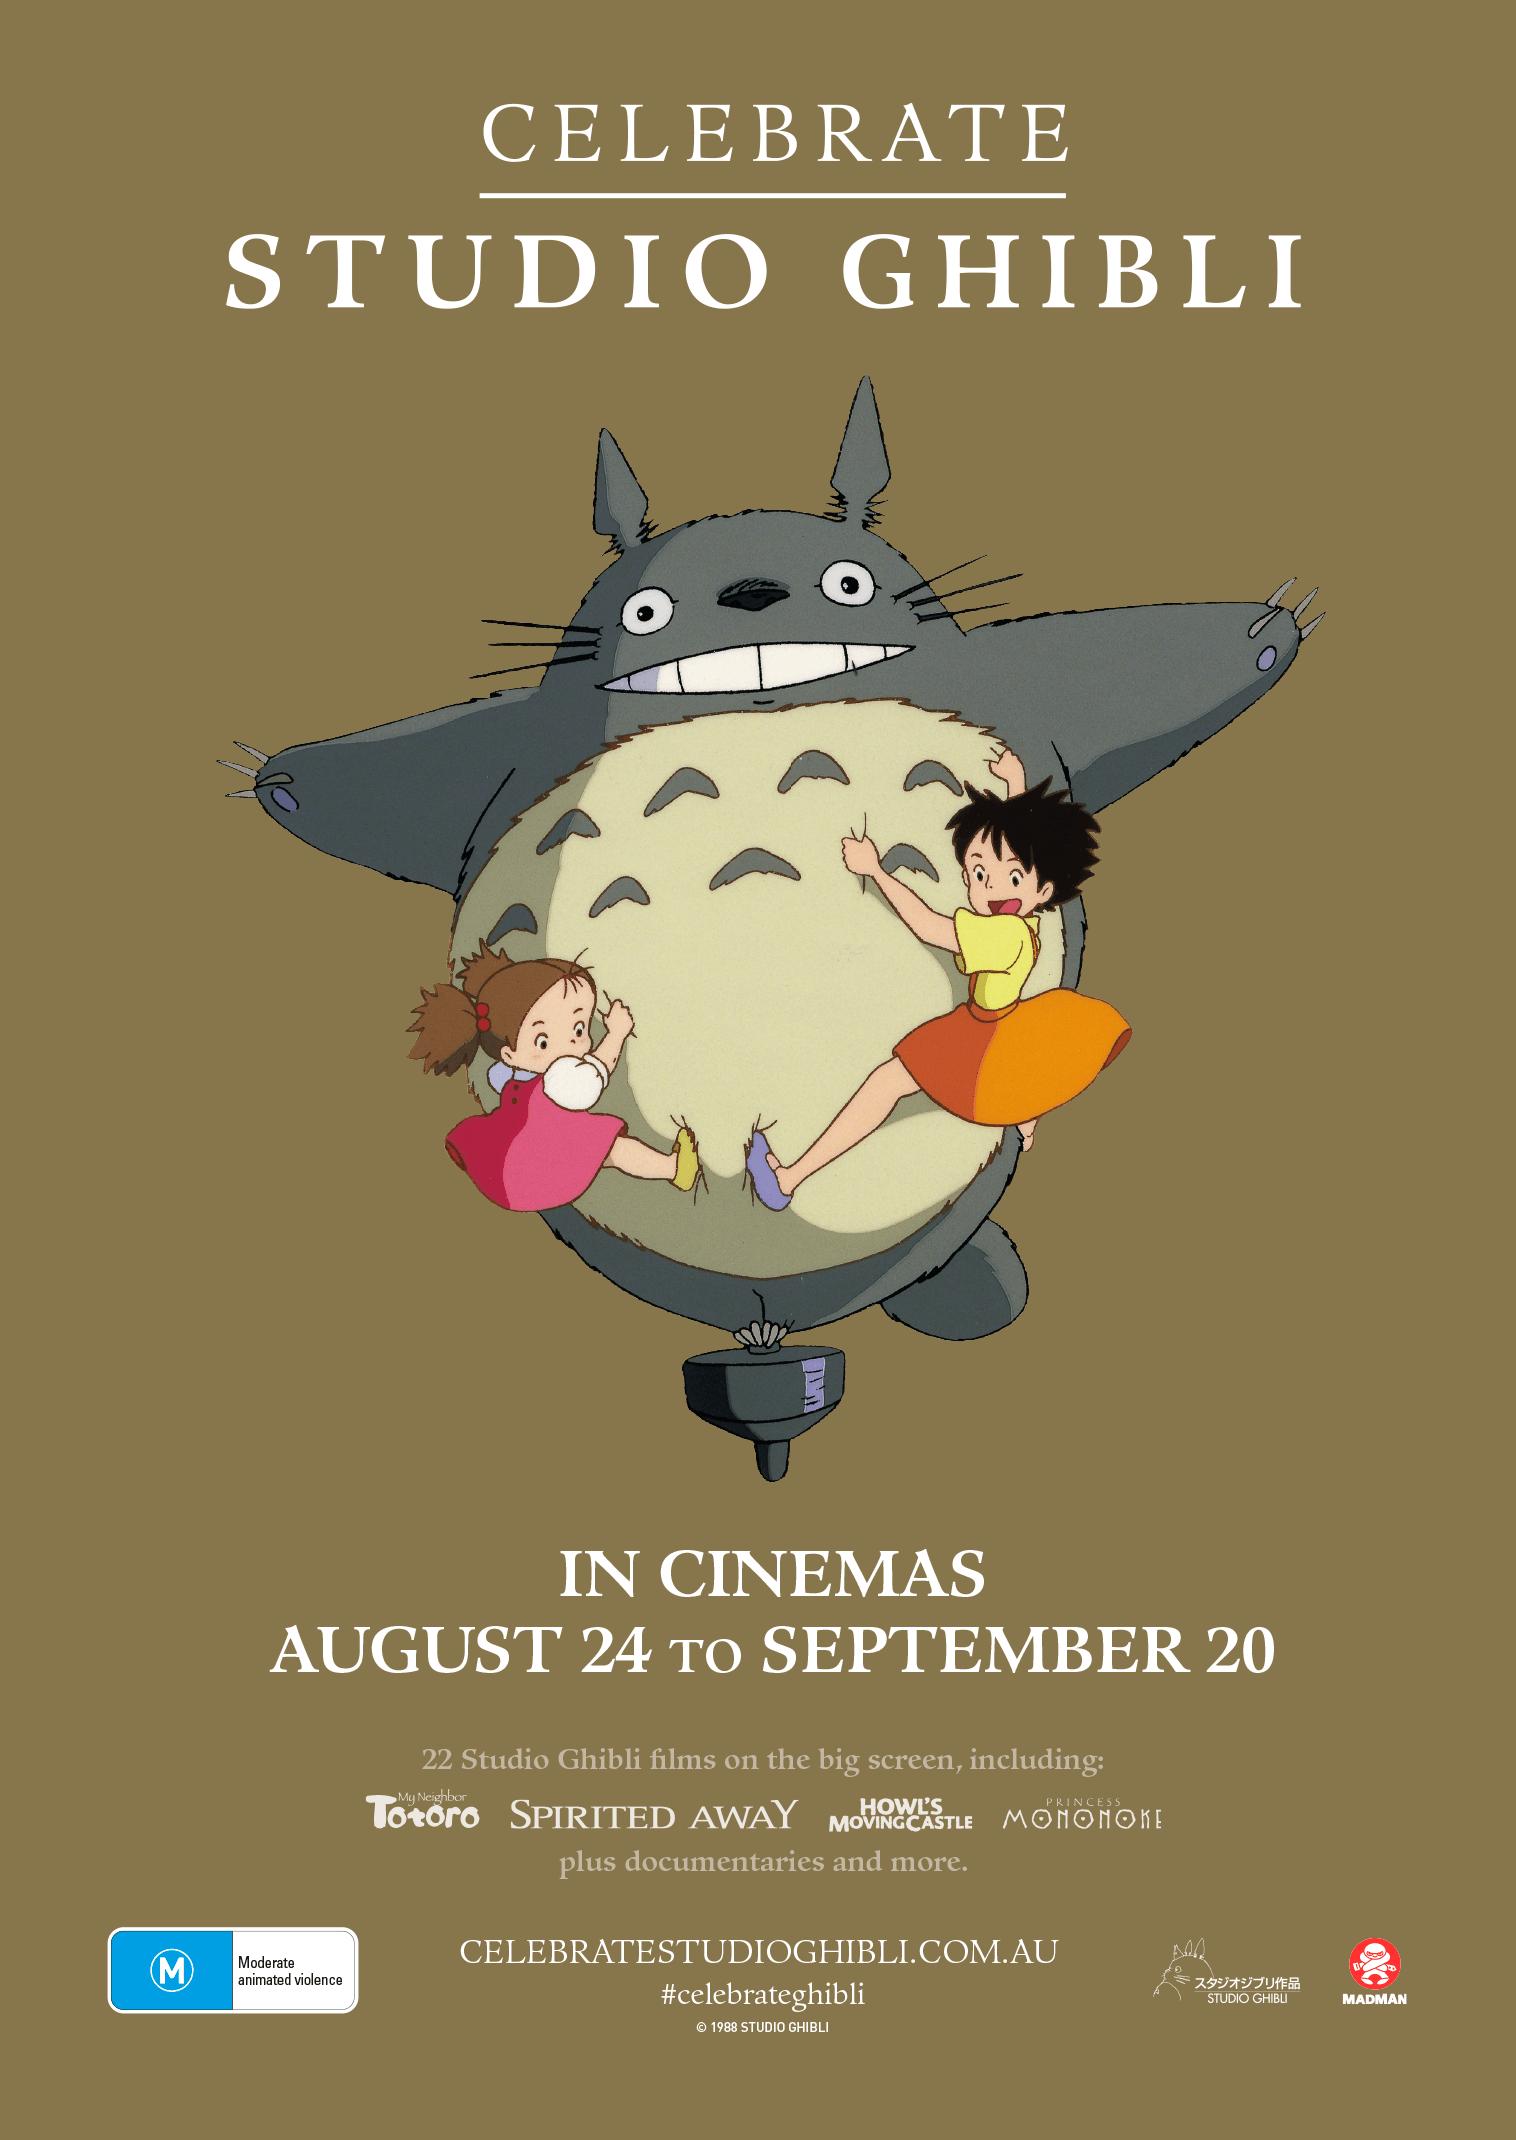 All Studio Ghibli Films Headed Back To The Big Screen For Celebrate